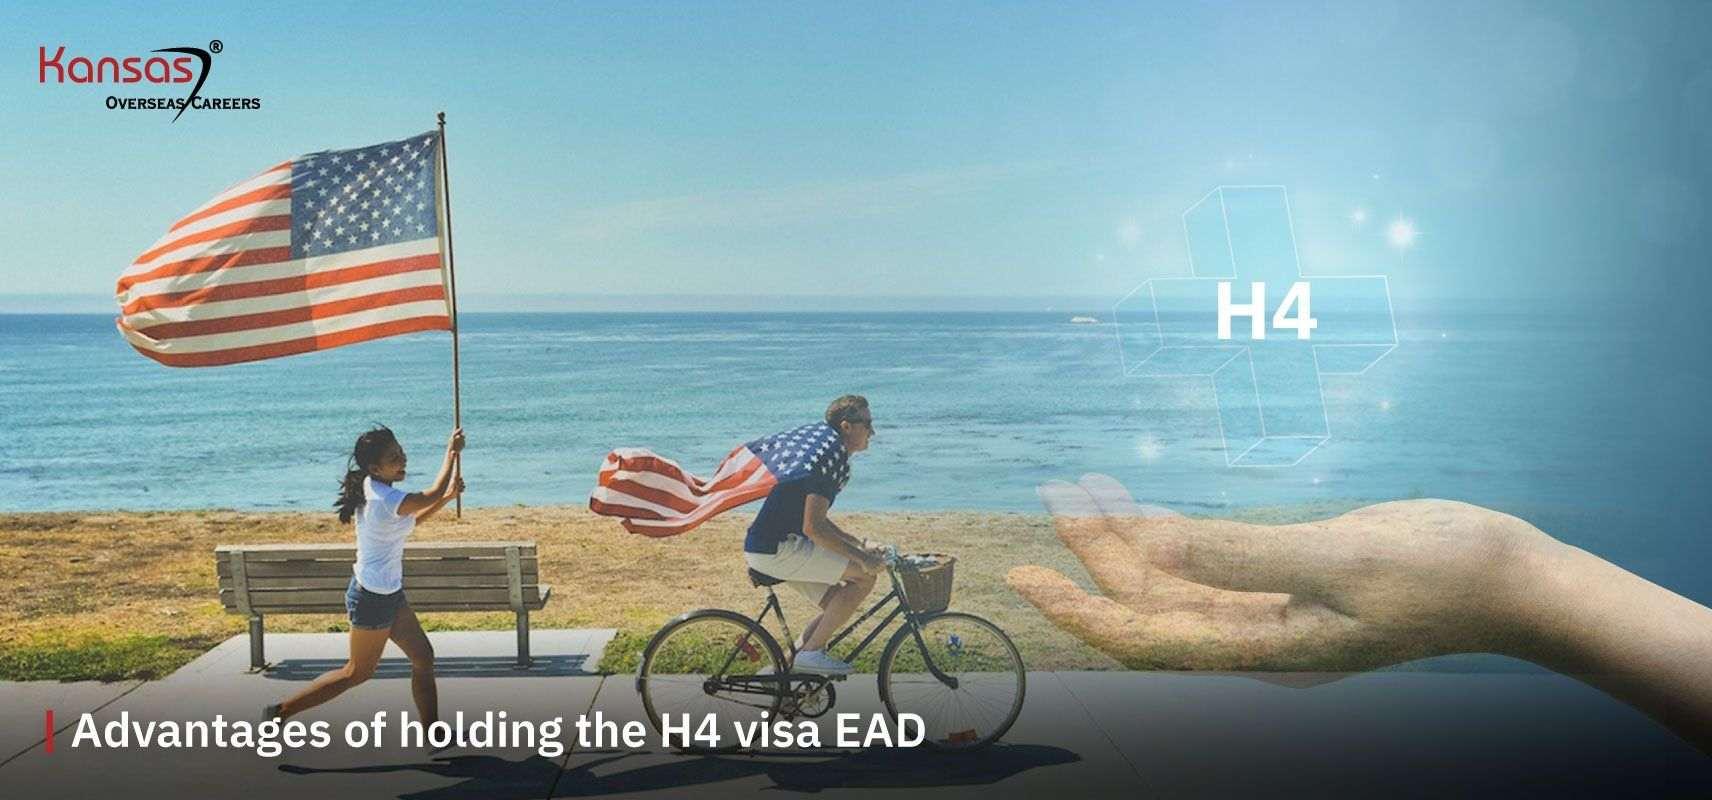 Advantages-of-holding-the-H4-visa-EAD